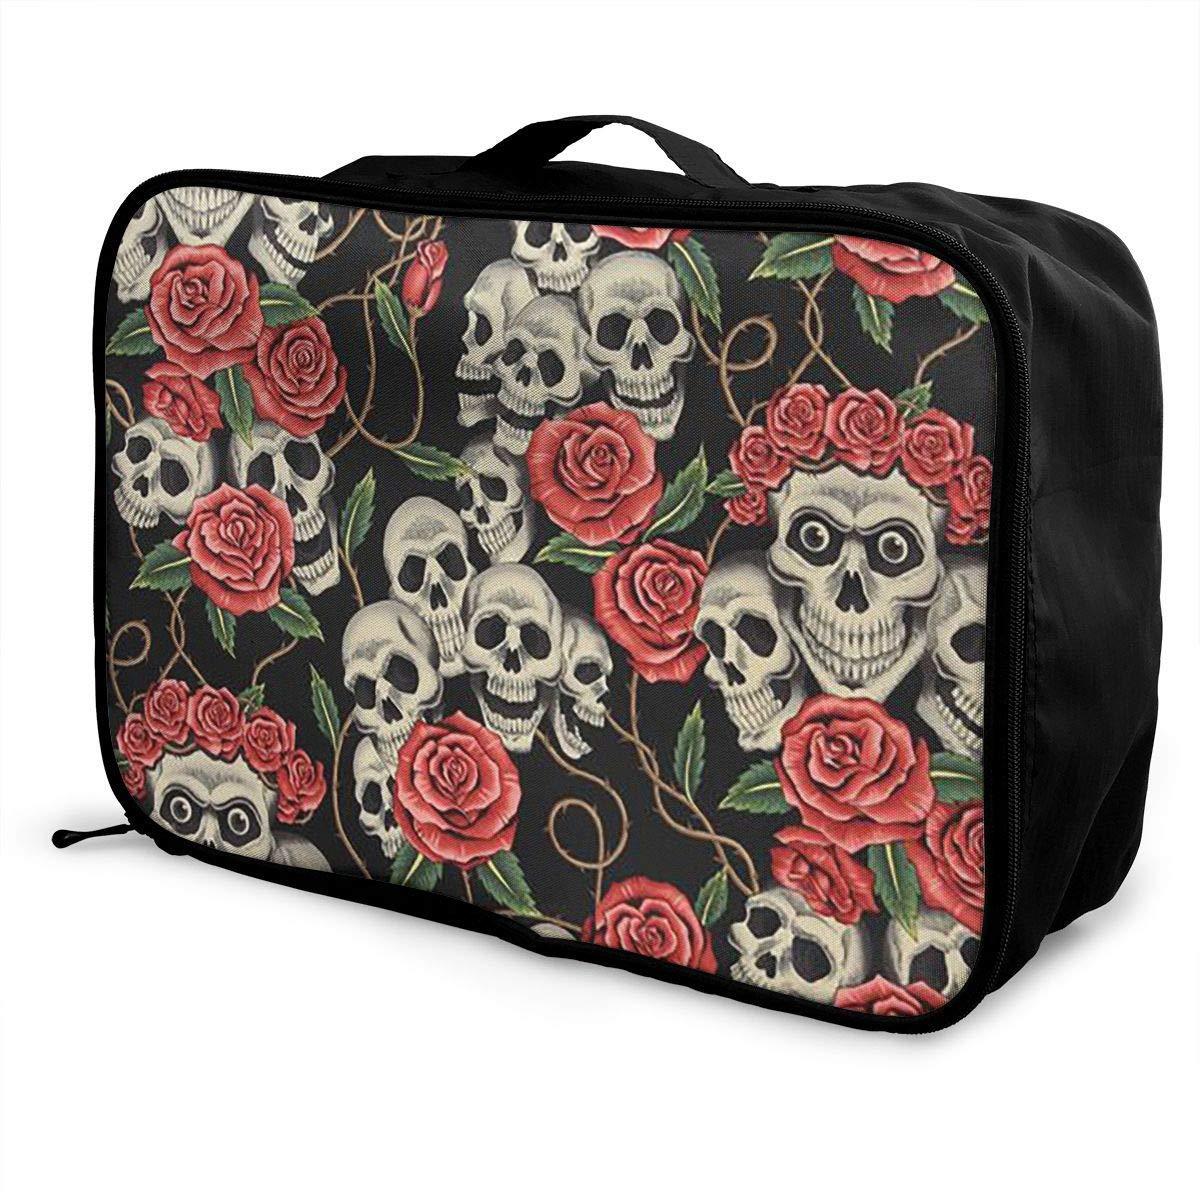 Portable Luggage Duffel Bag Sugar Skull Travel Bags Carry-on In Trolley Handle